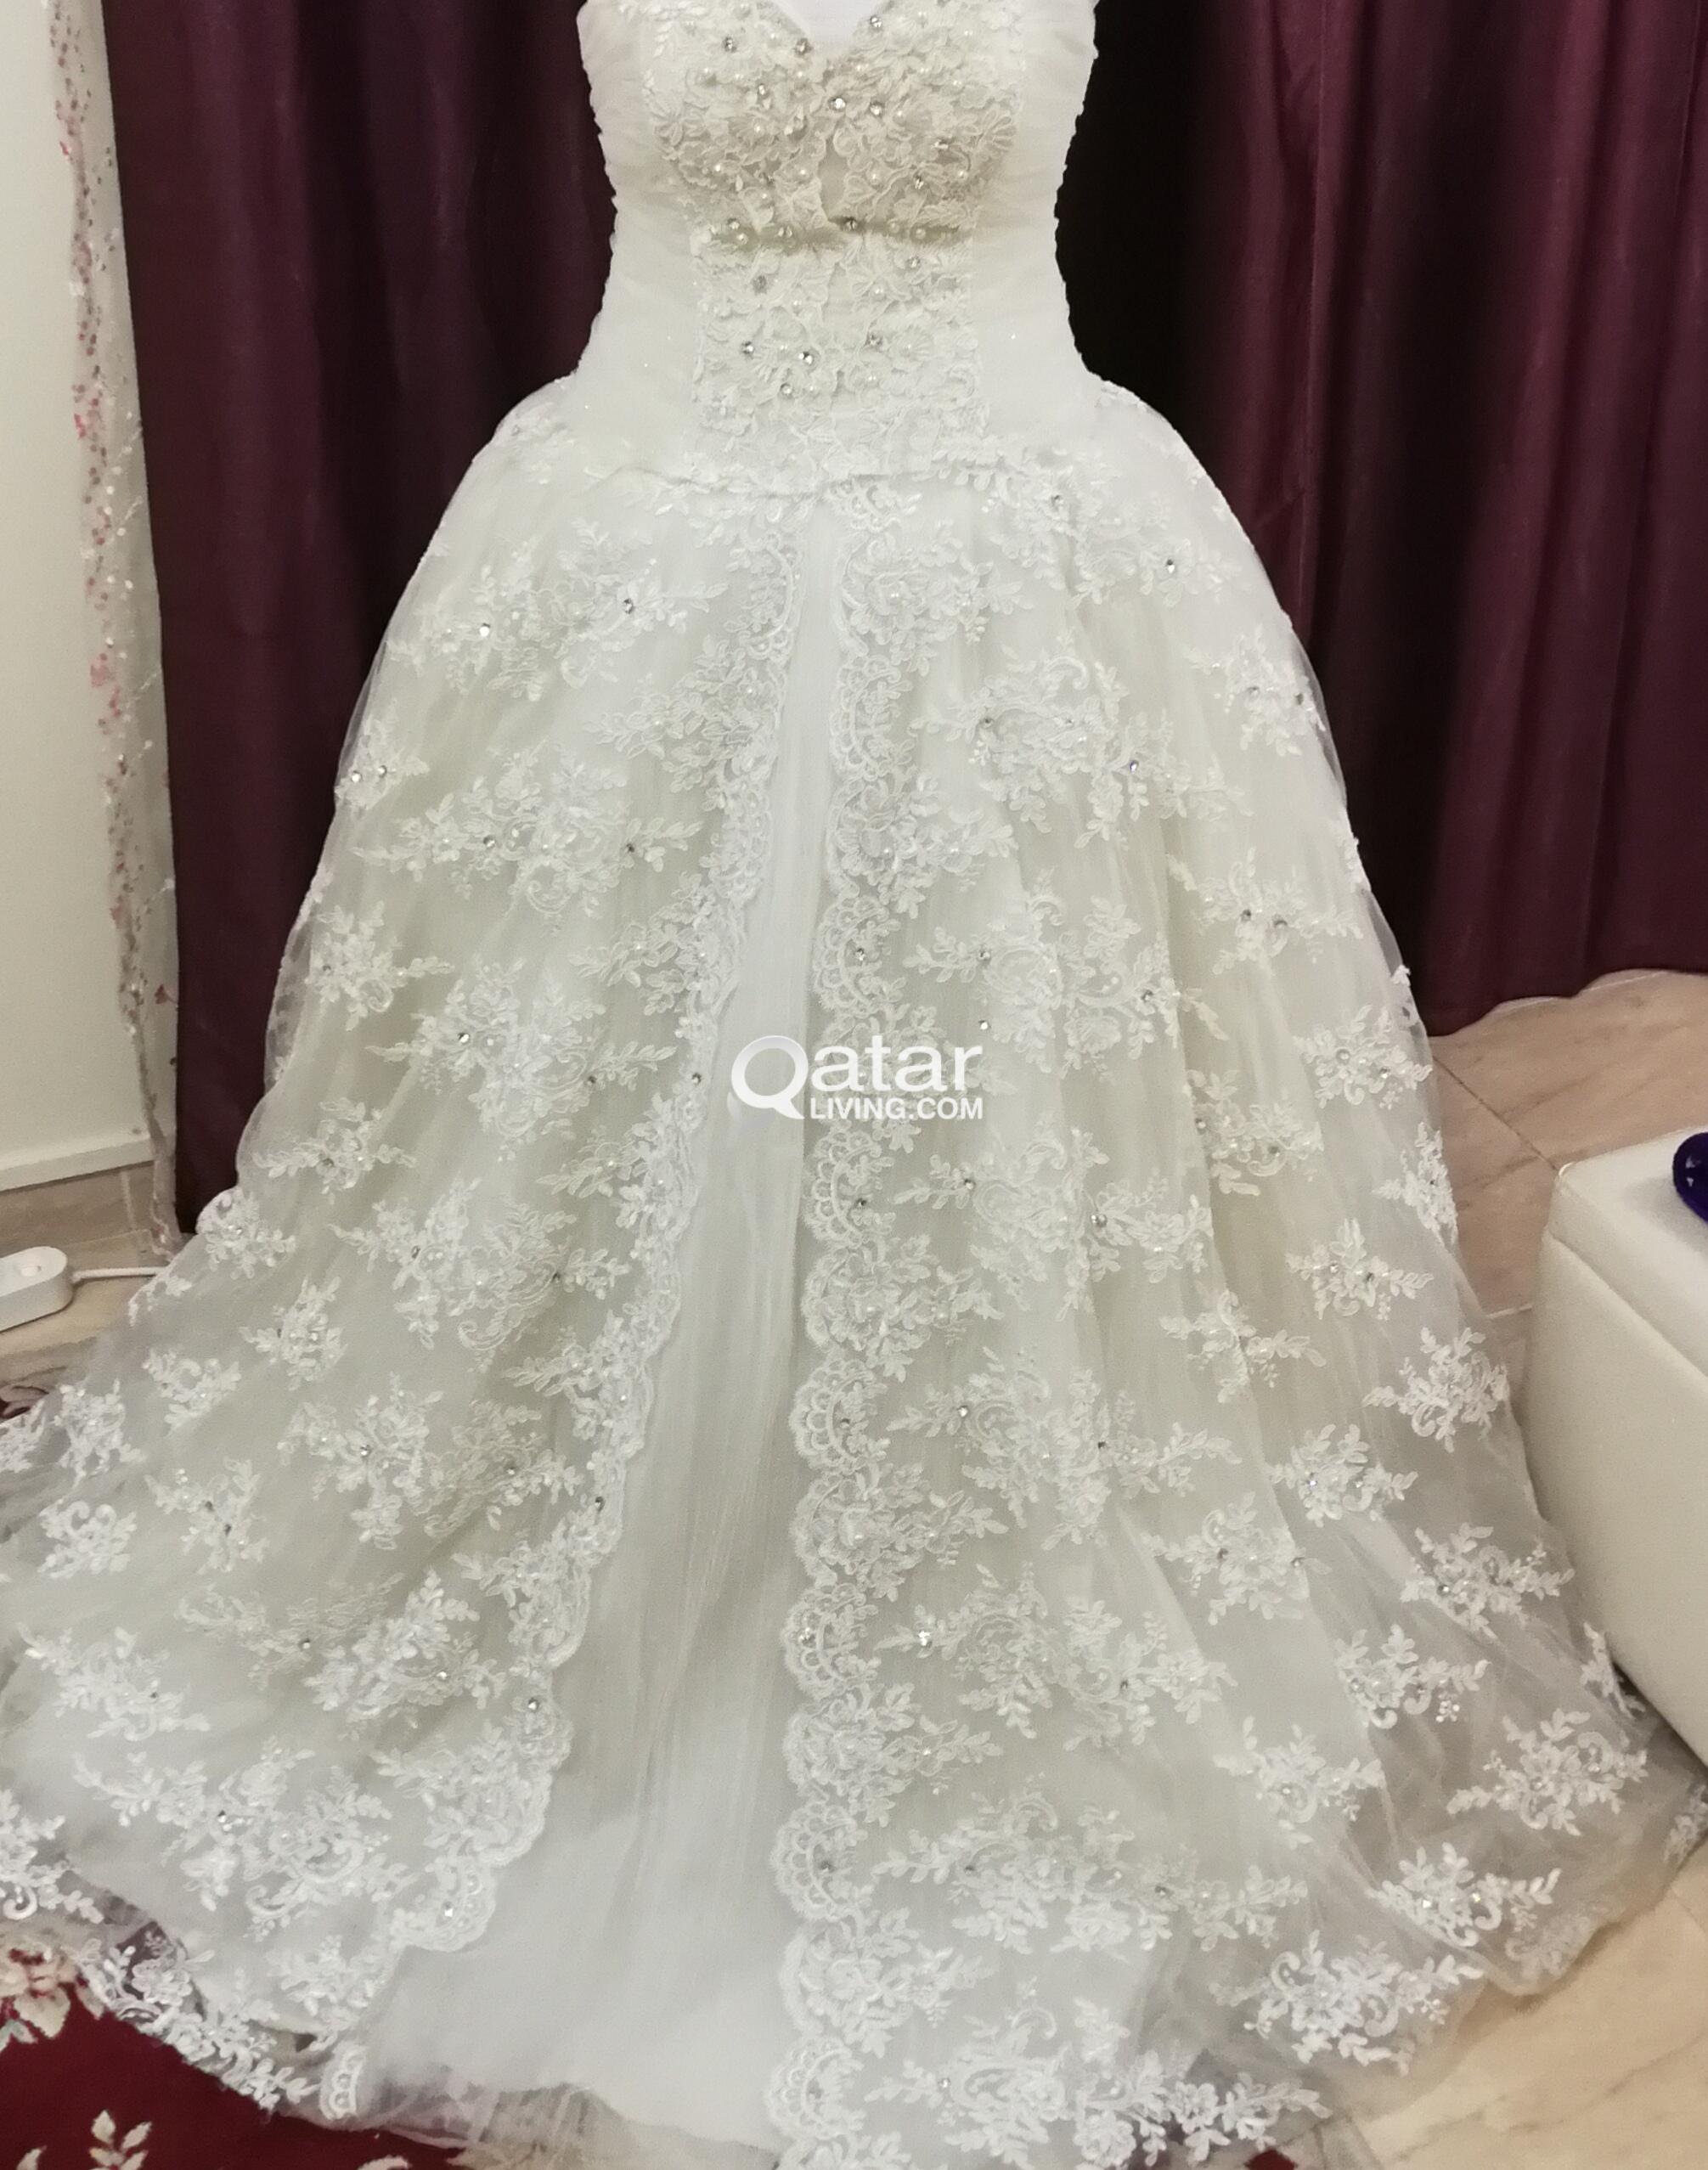 wedding dress qatar living